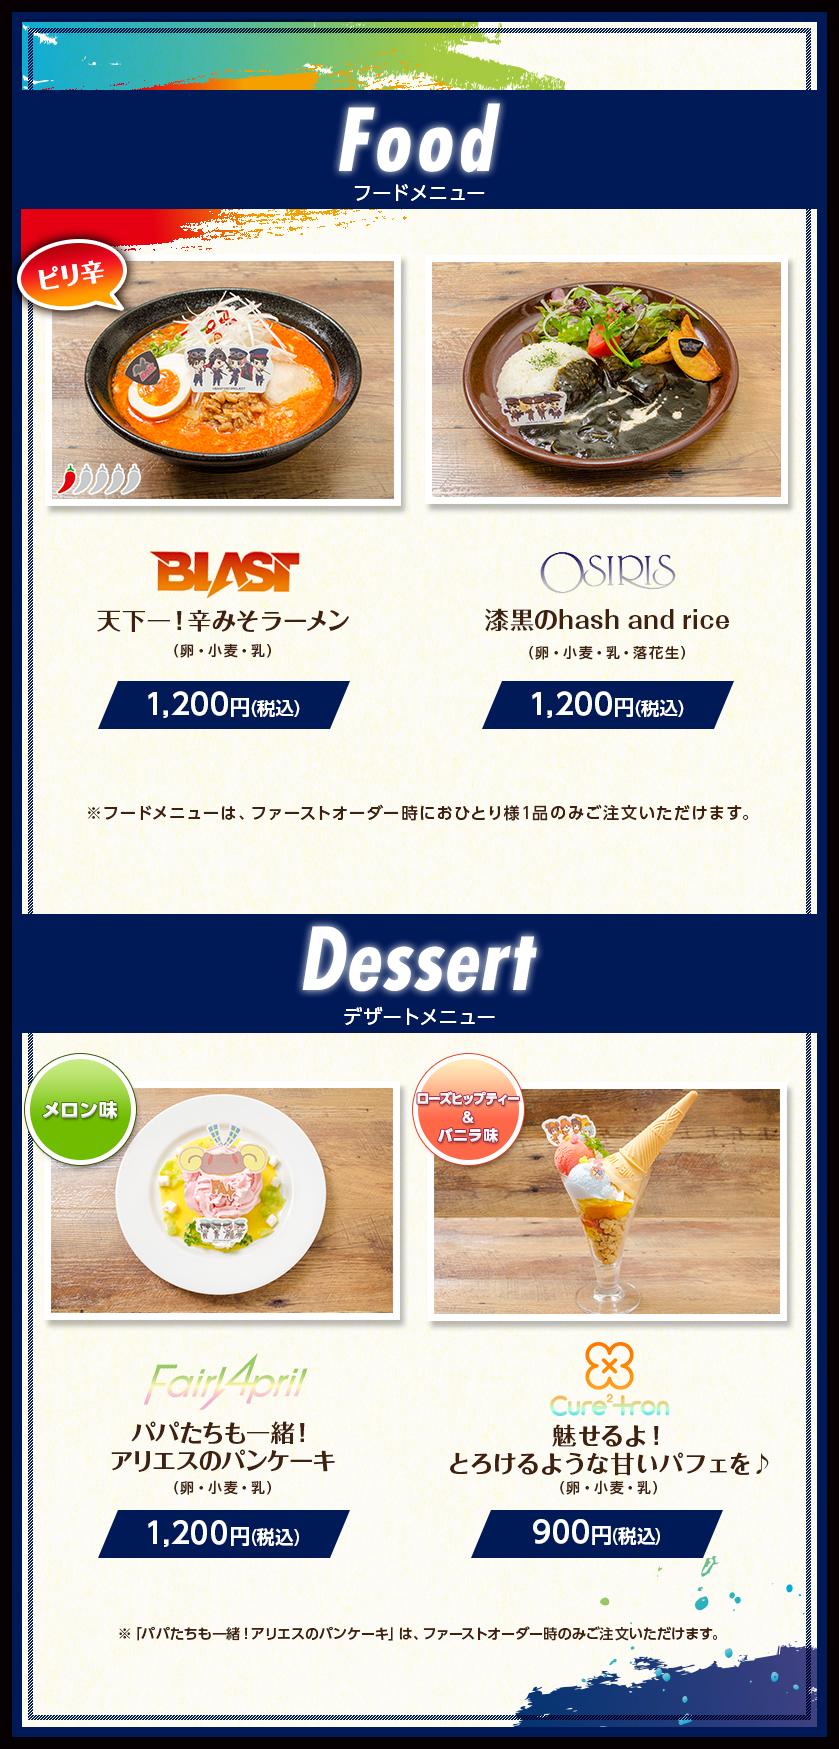 menu_food_dz01.png